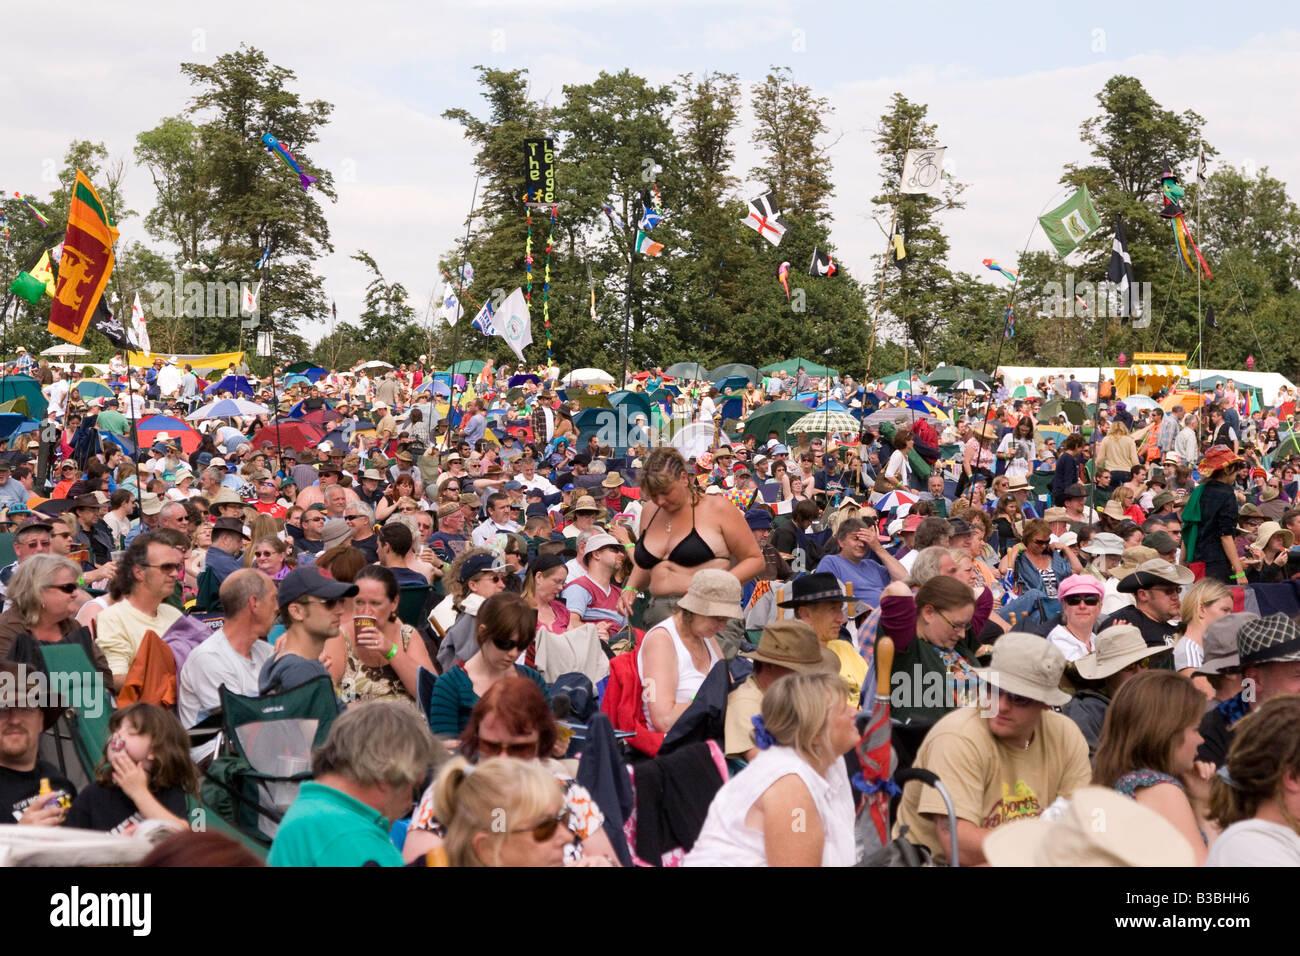 general crowd scene at Fairport s Cropredy Convention music festival 2008 near Banbury England UK - Stock Image